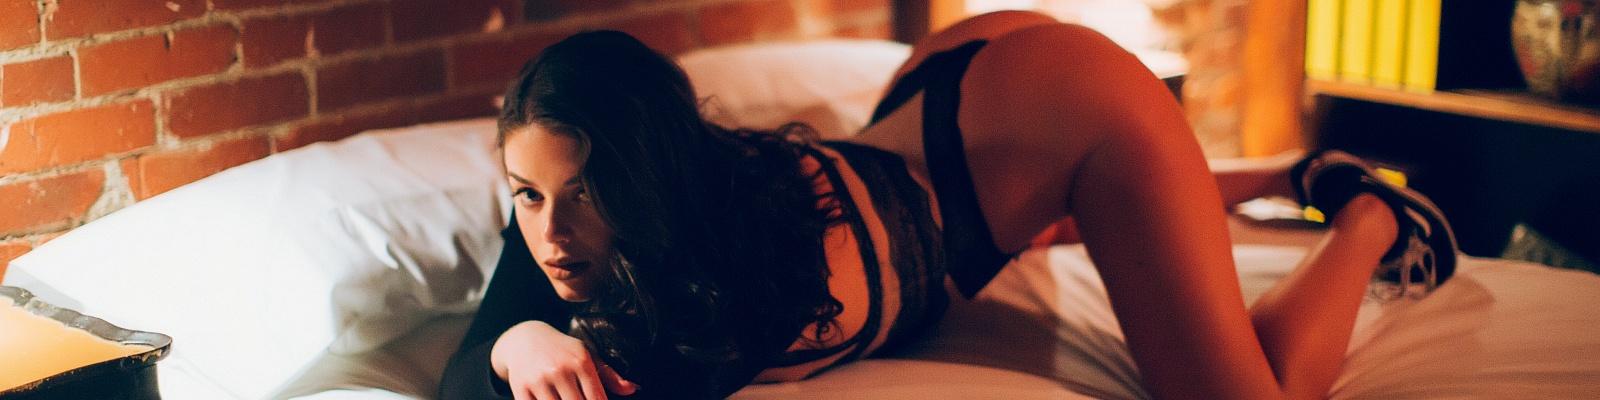 Audrey Santana's Cover Photo